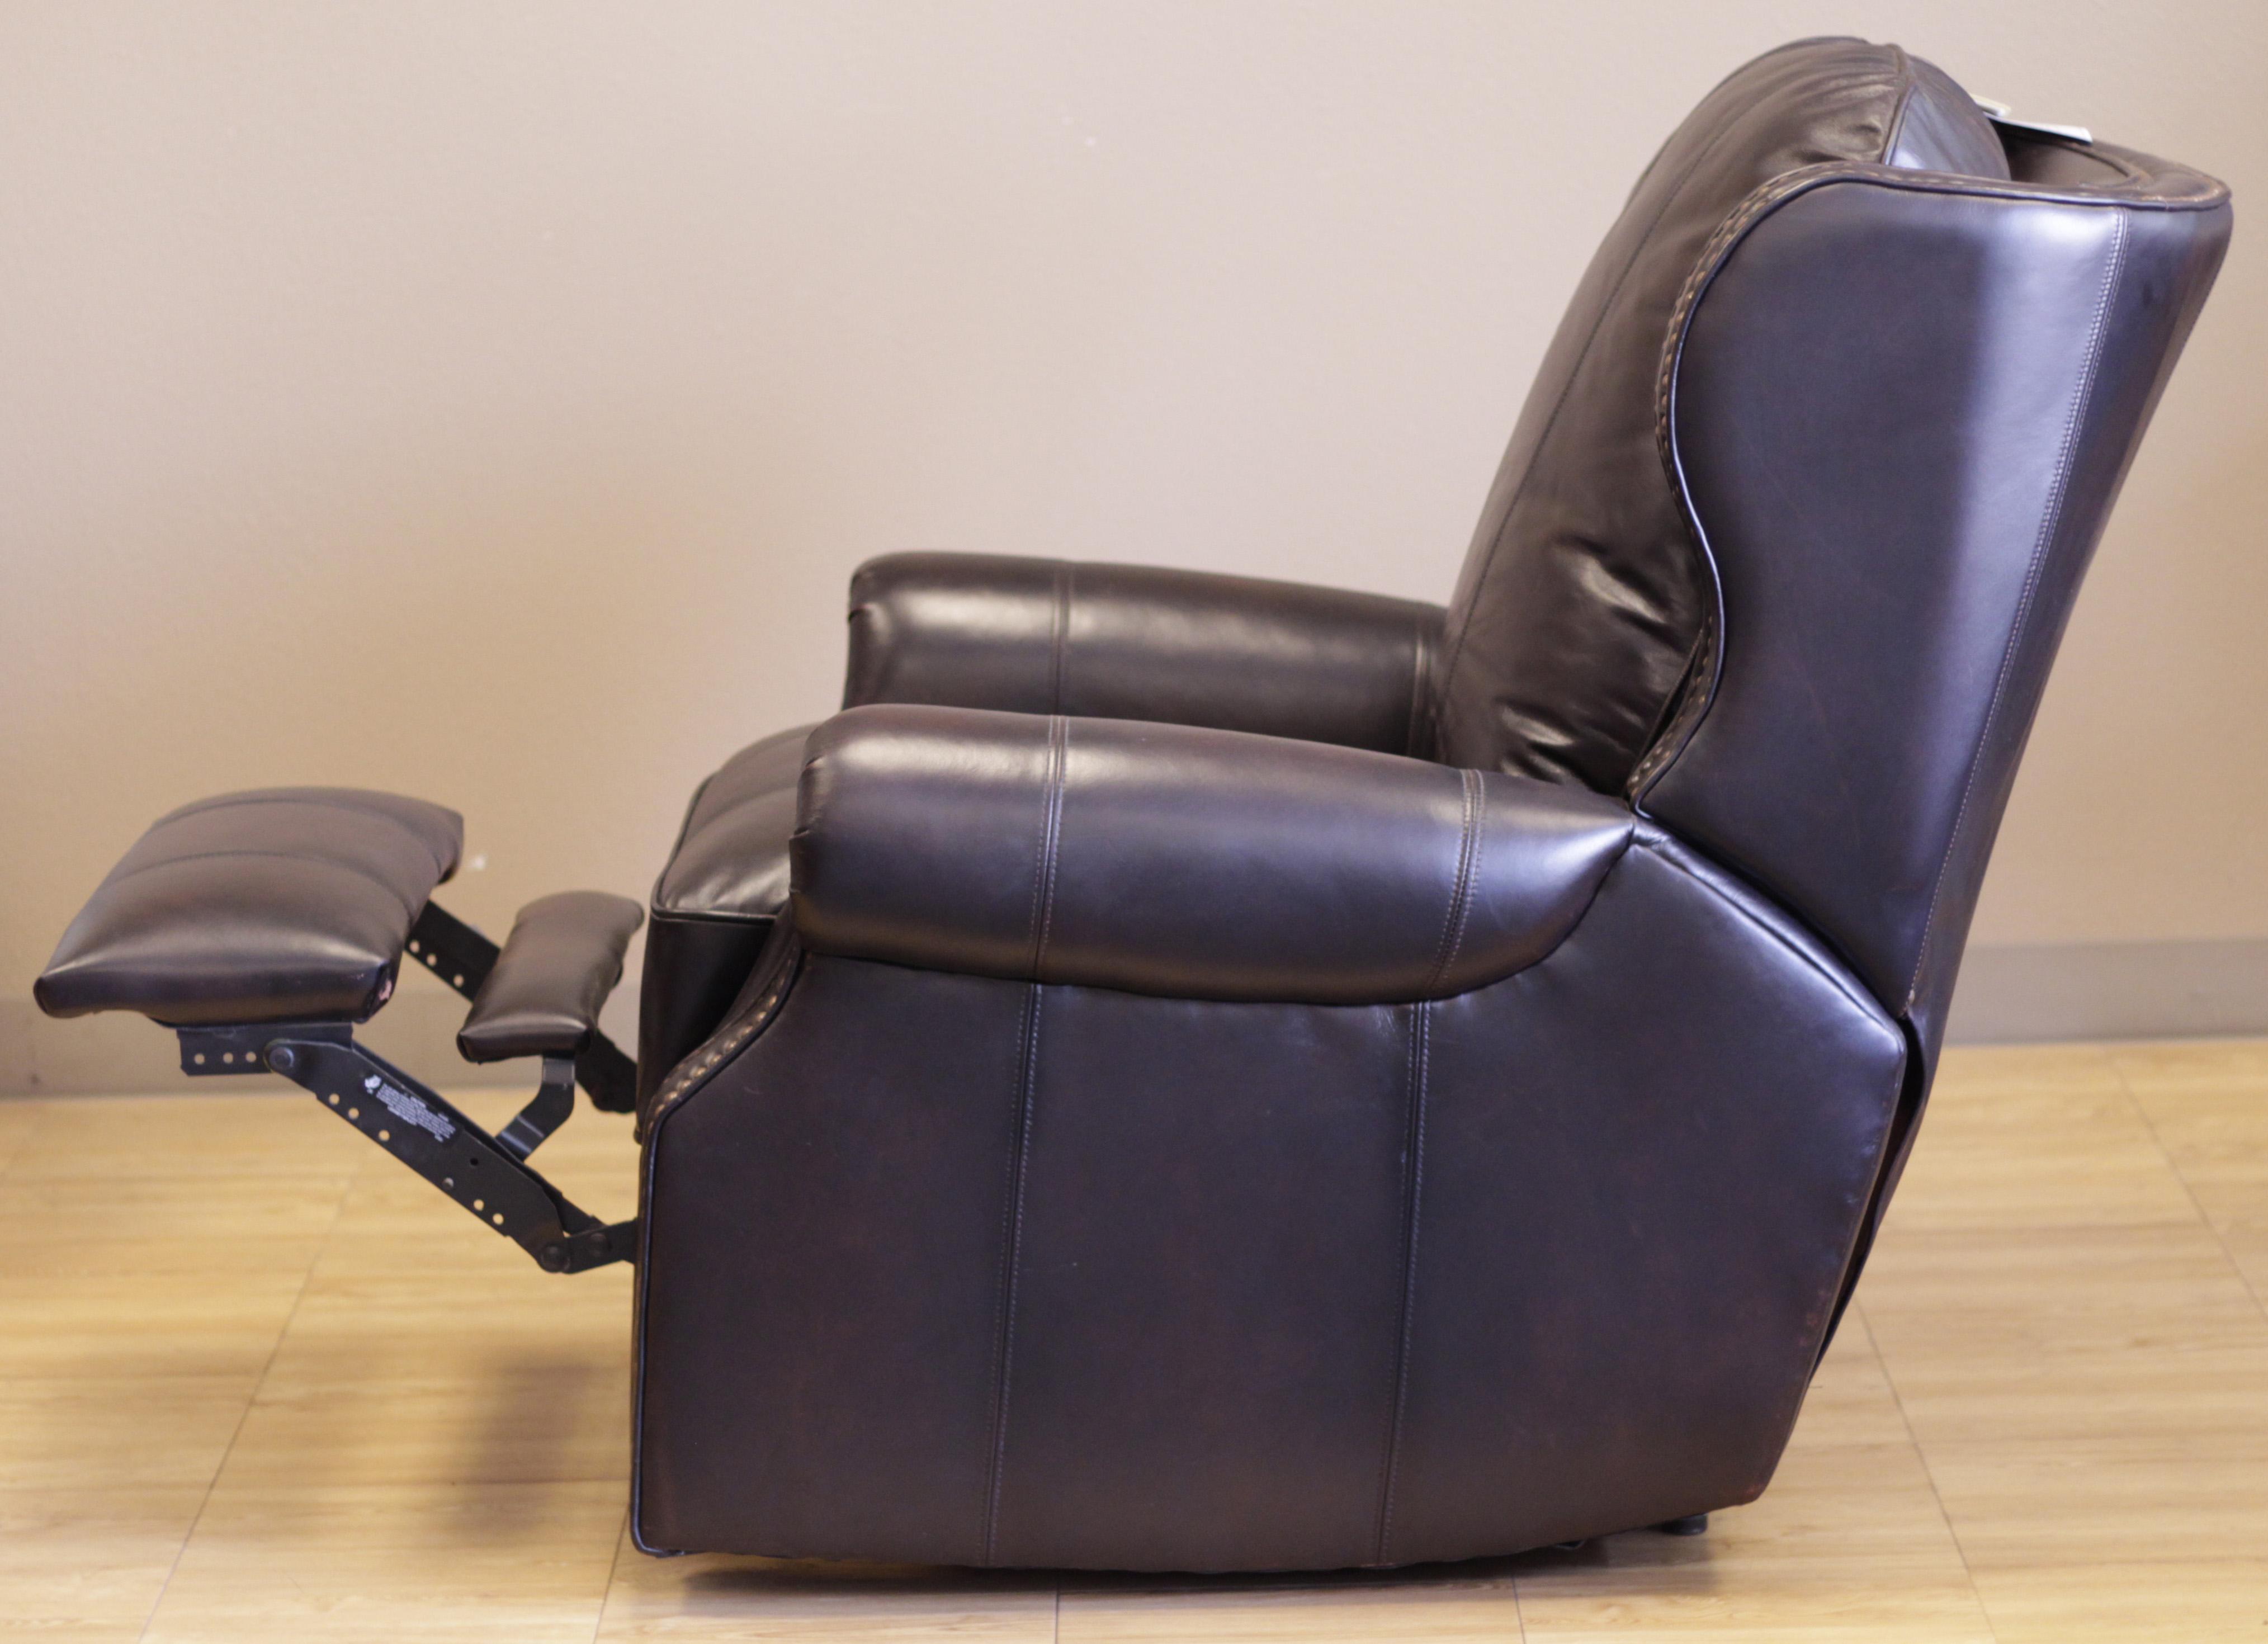 Beau Barcalounger Recliner Bristol II Chair Stetson Bordeaux Top Grain Leather